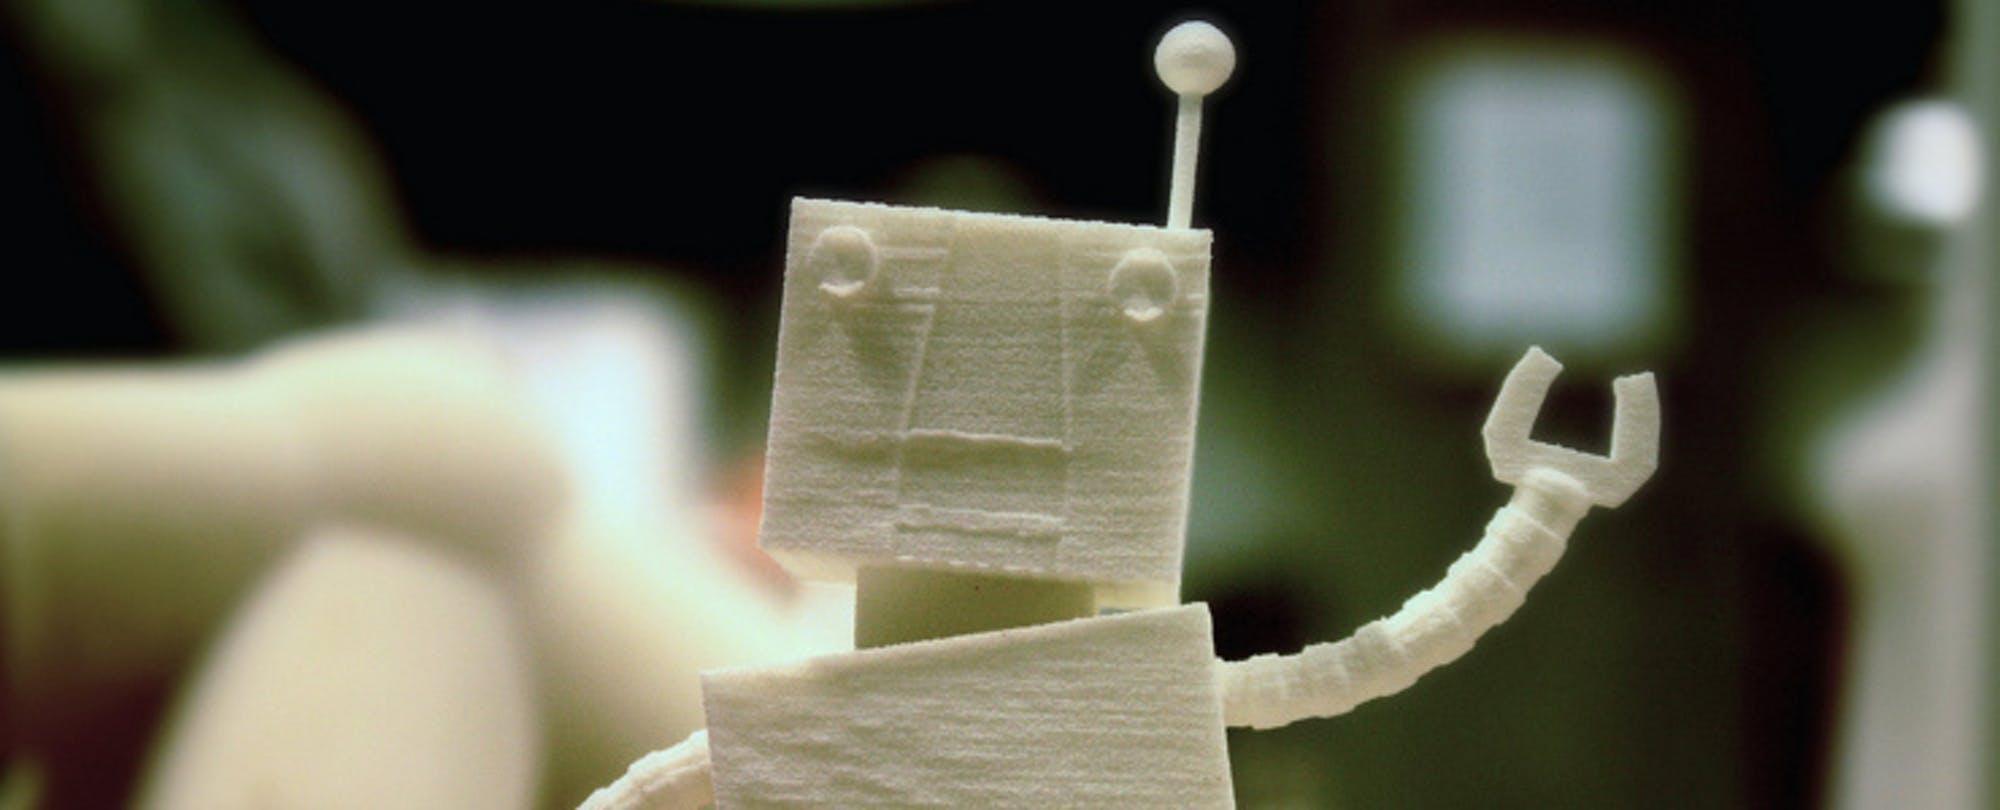 Maker Dad: Make Makers, Not Robots